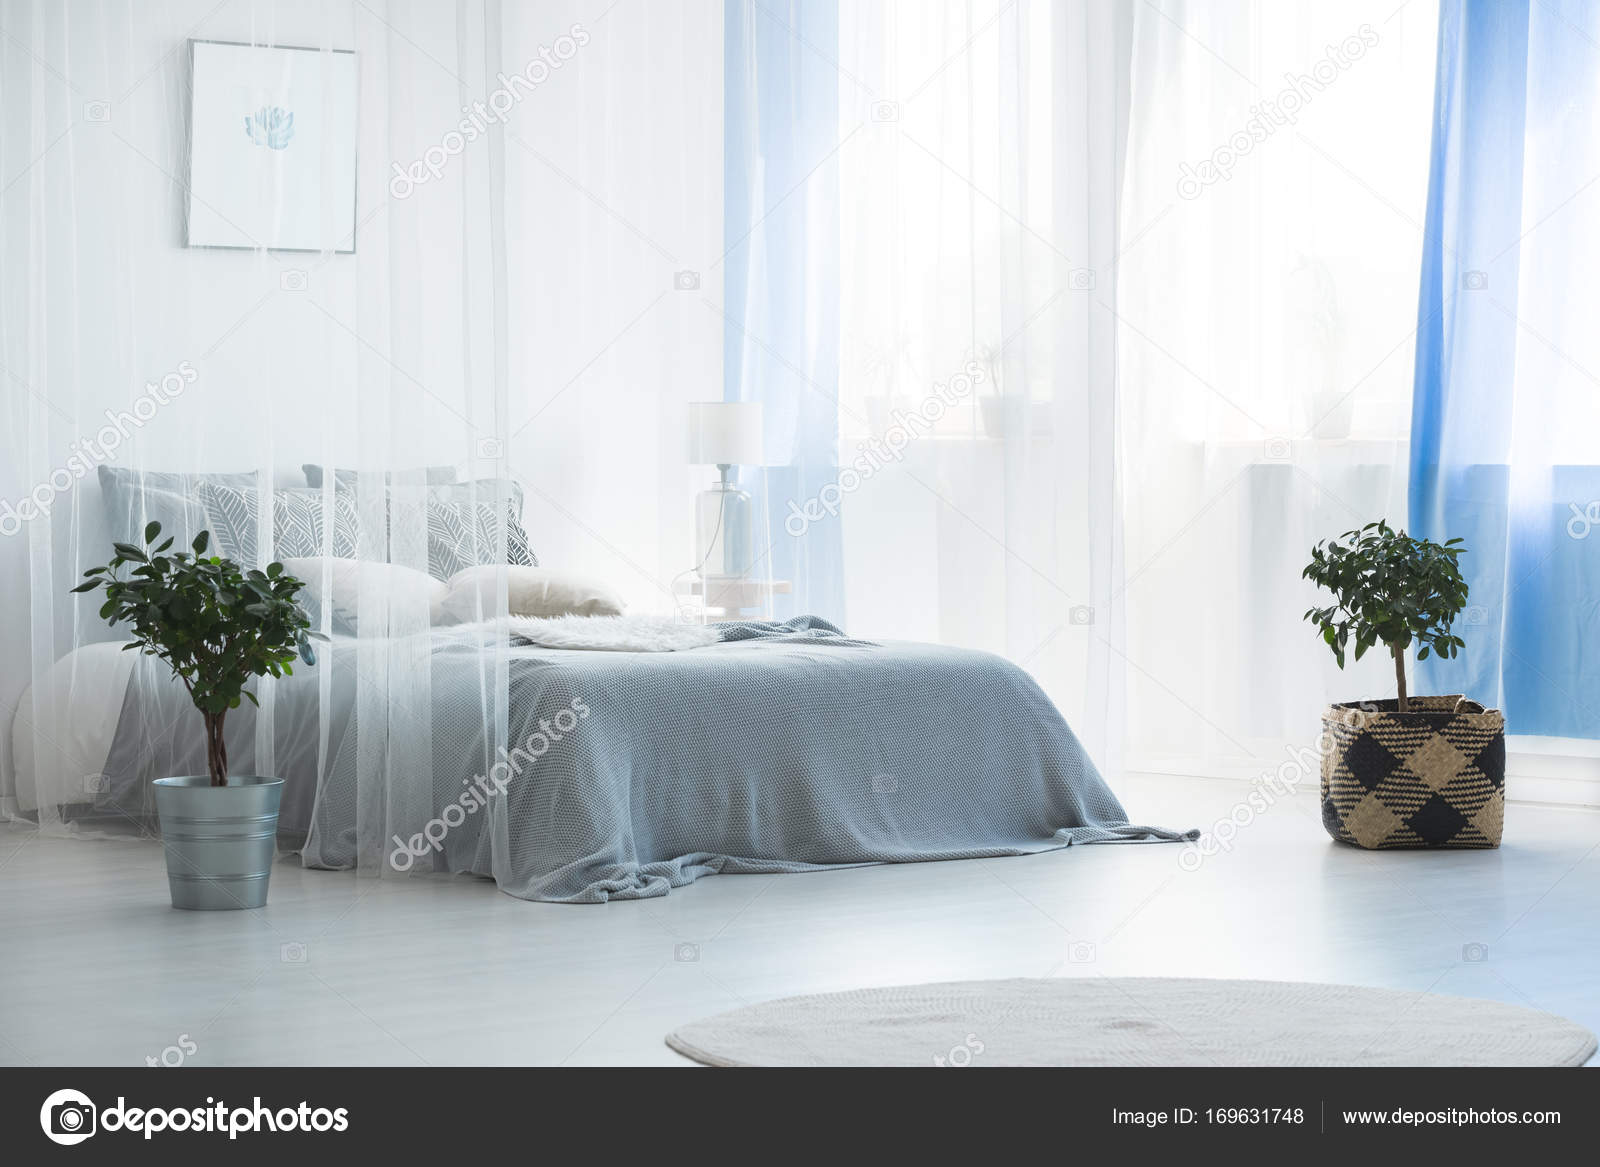 letto con baldacchino — Foto Stock © photographee.eu #169631748